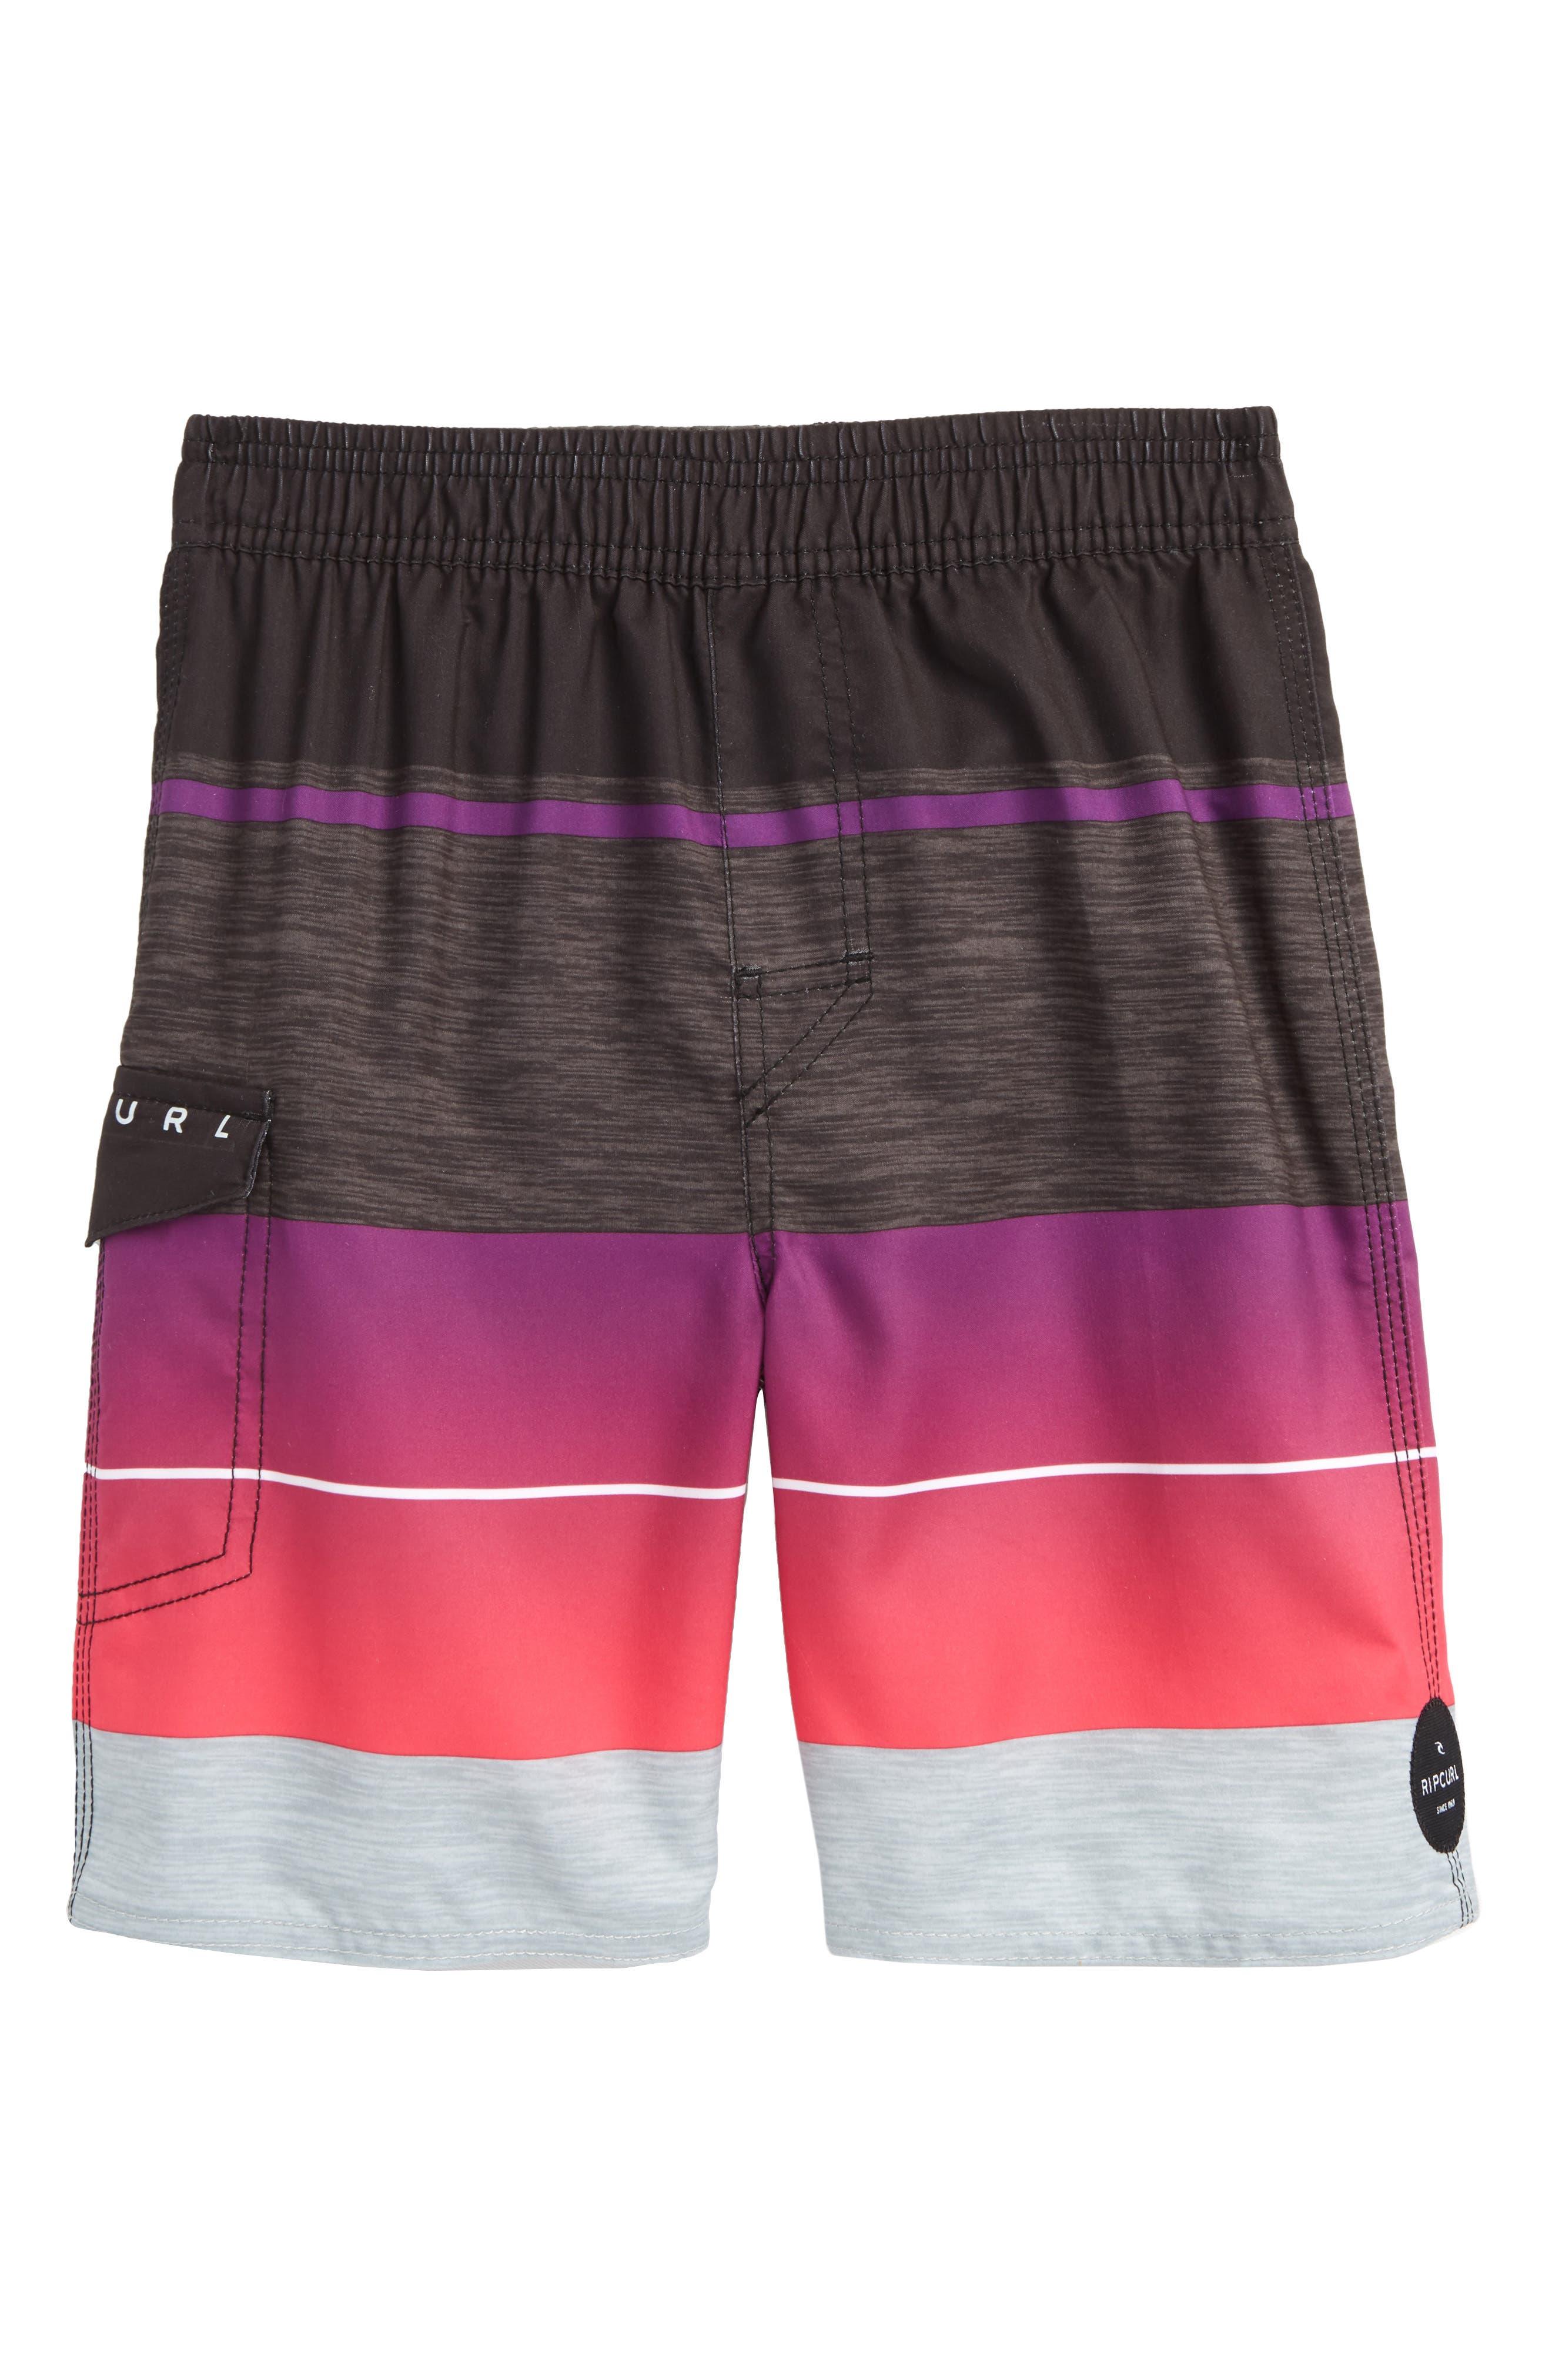 Mirage Eclipse Volley Shorts,                             Main thumbnail 1, color,                             Pink